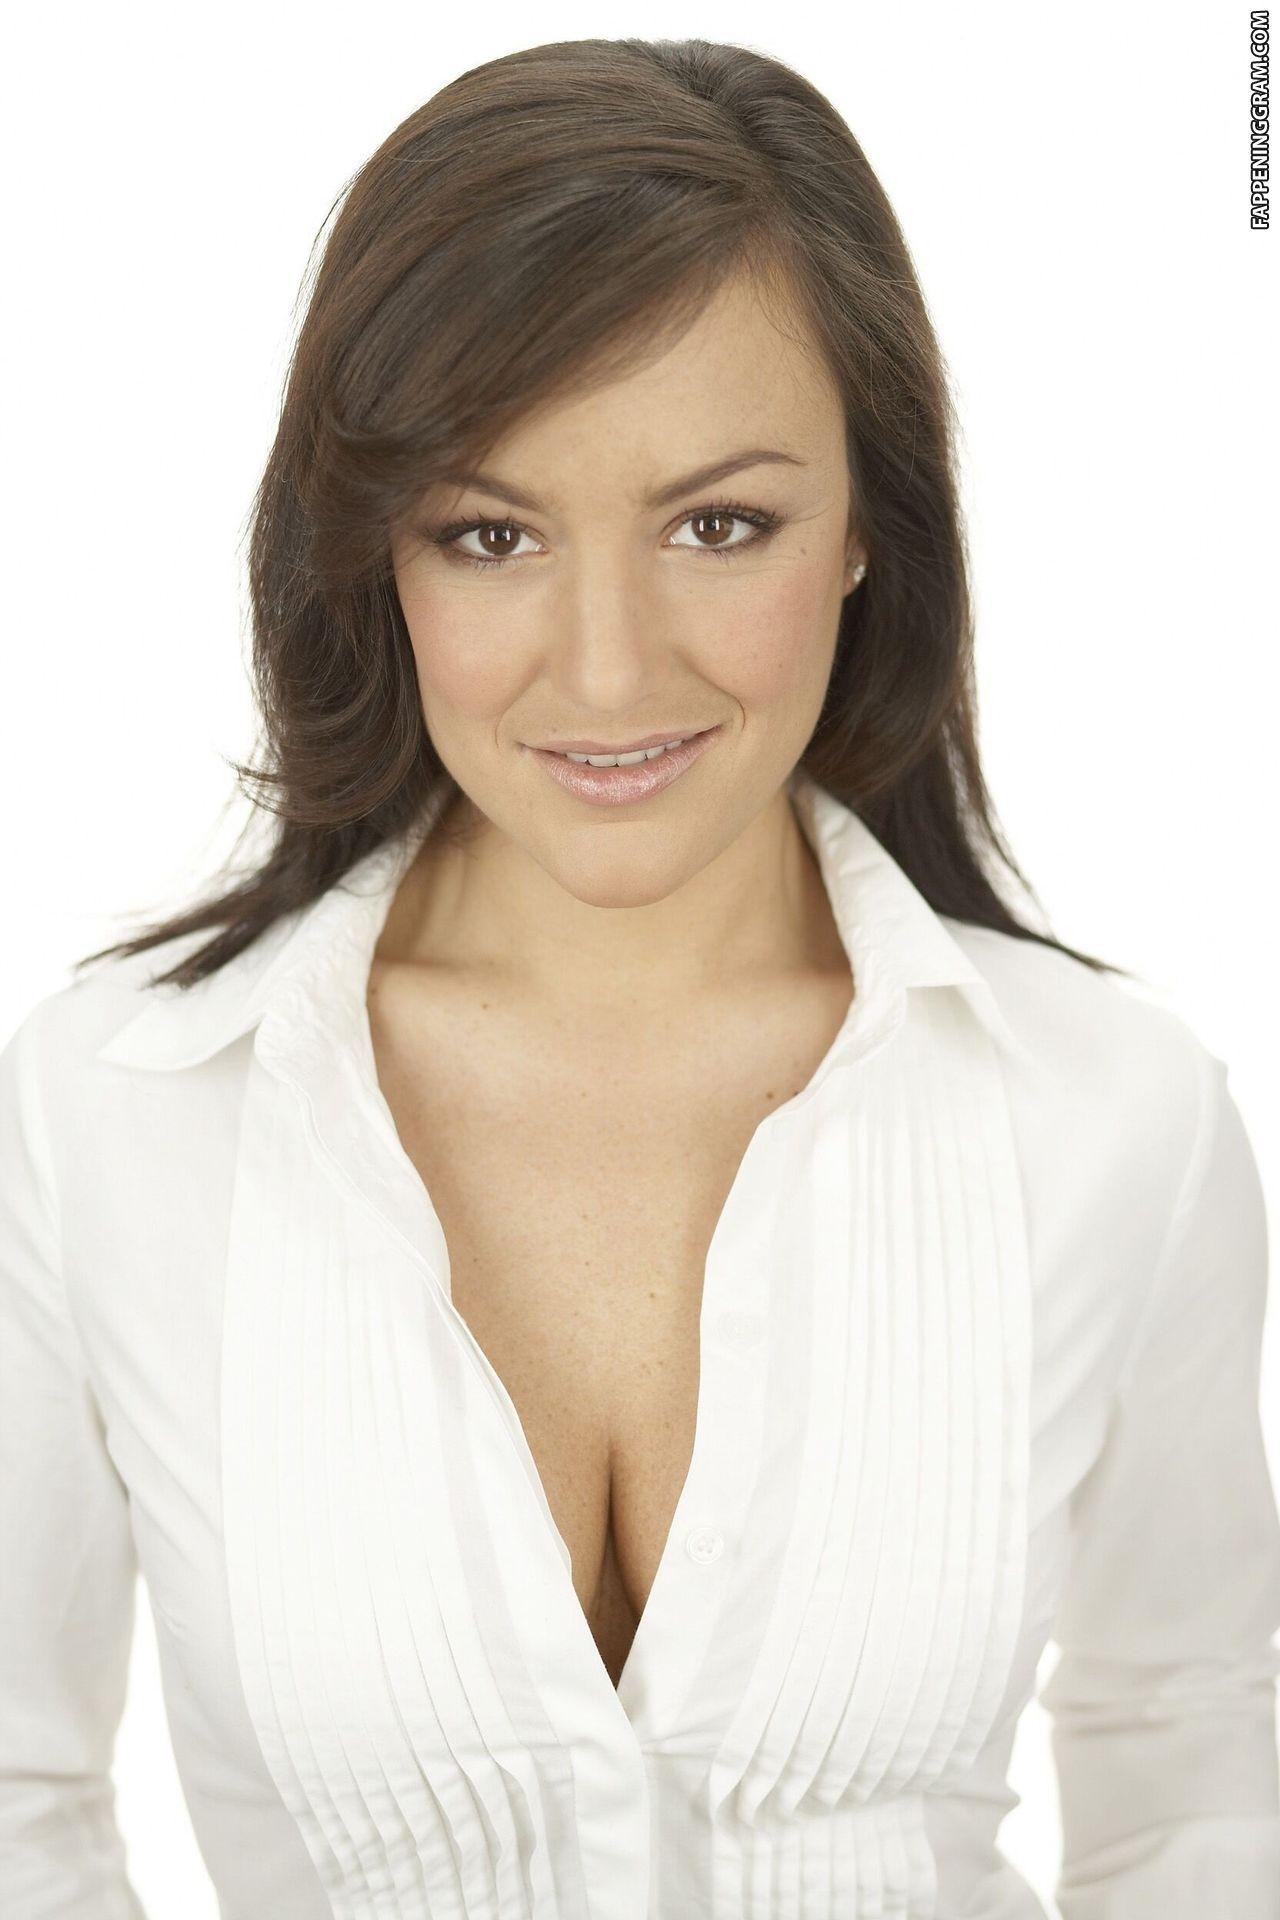 Miriam Pielhau Nude The Fappening - FappeningGram